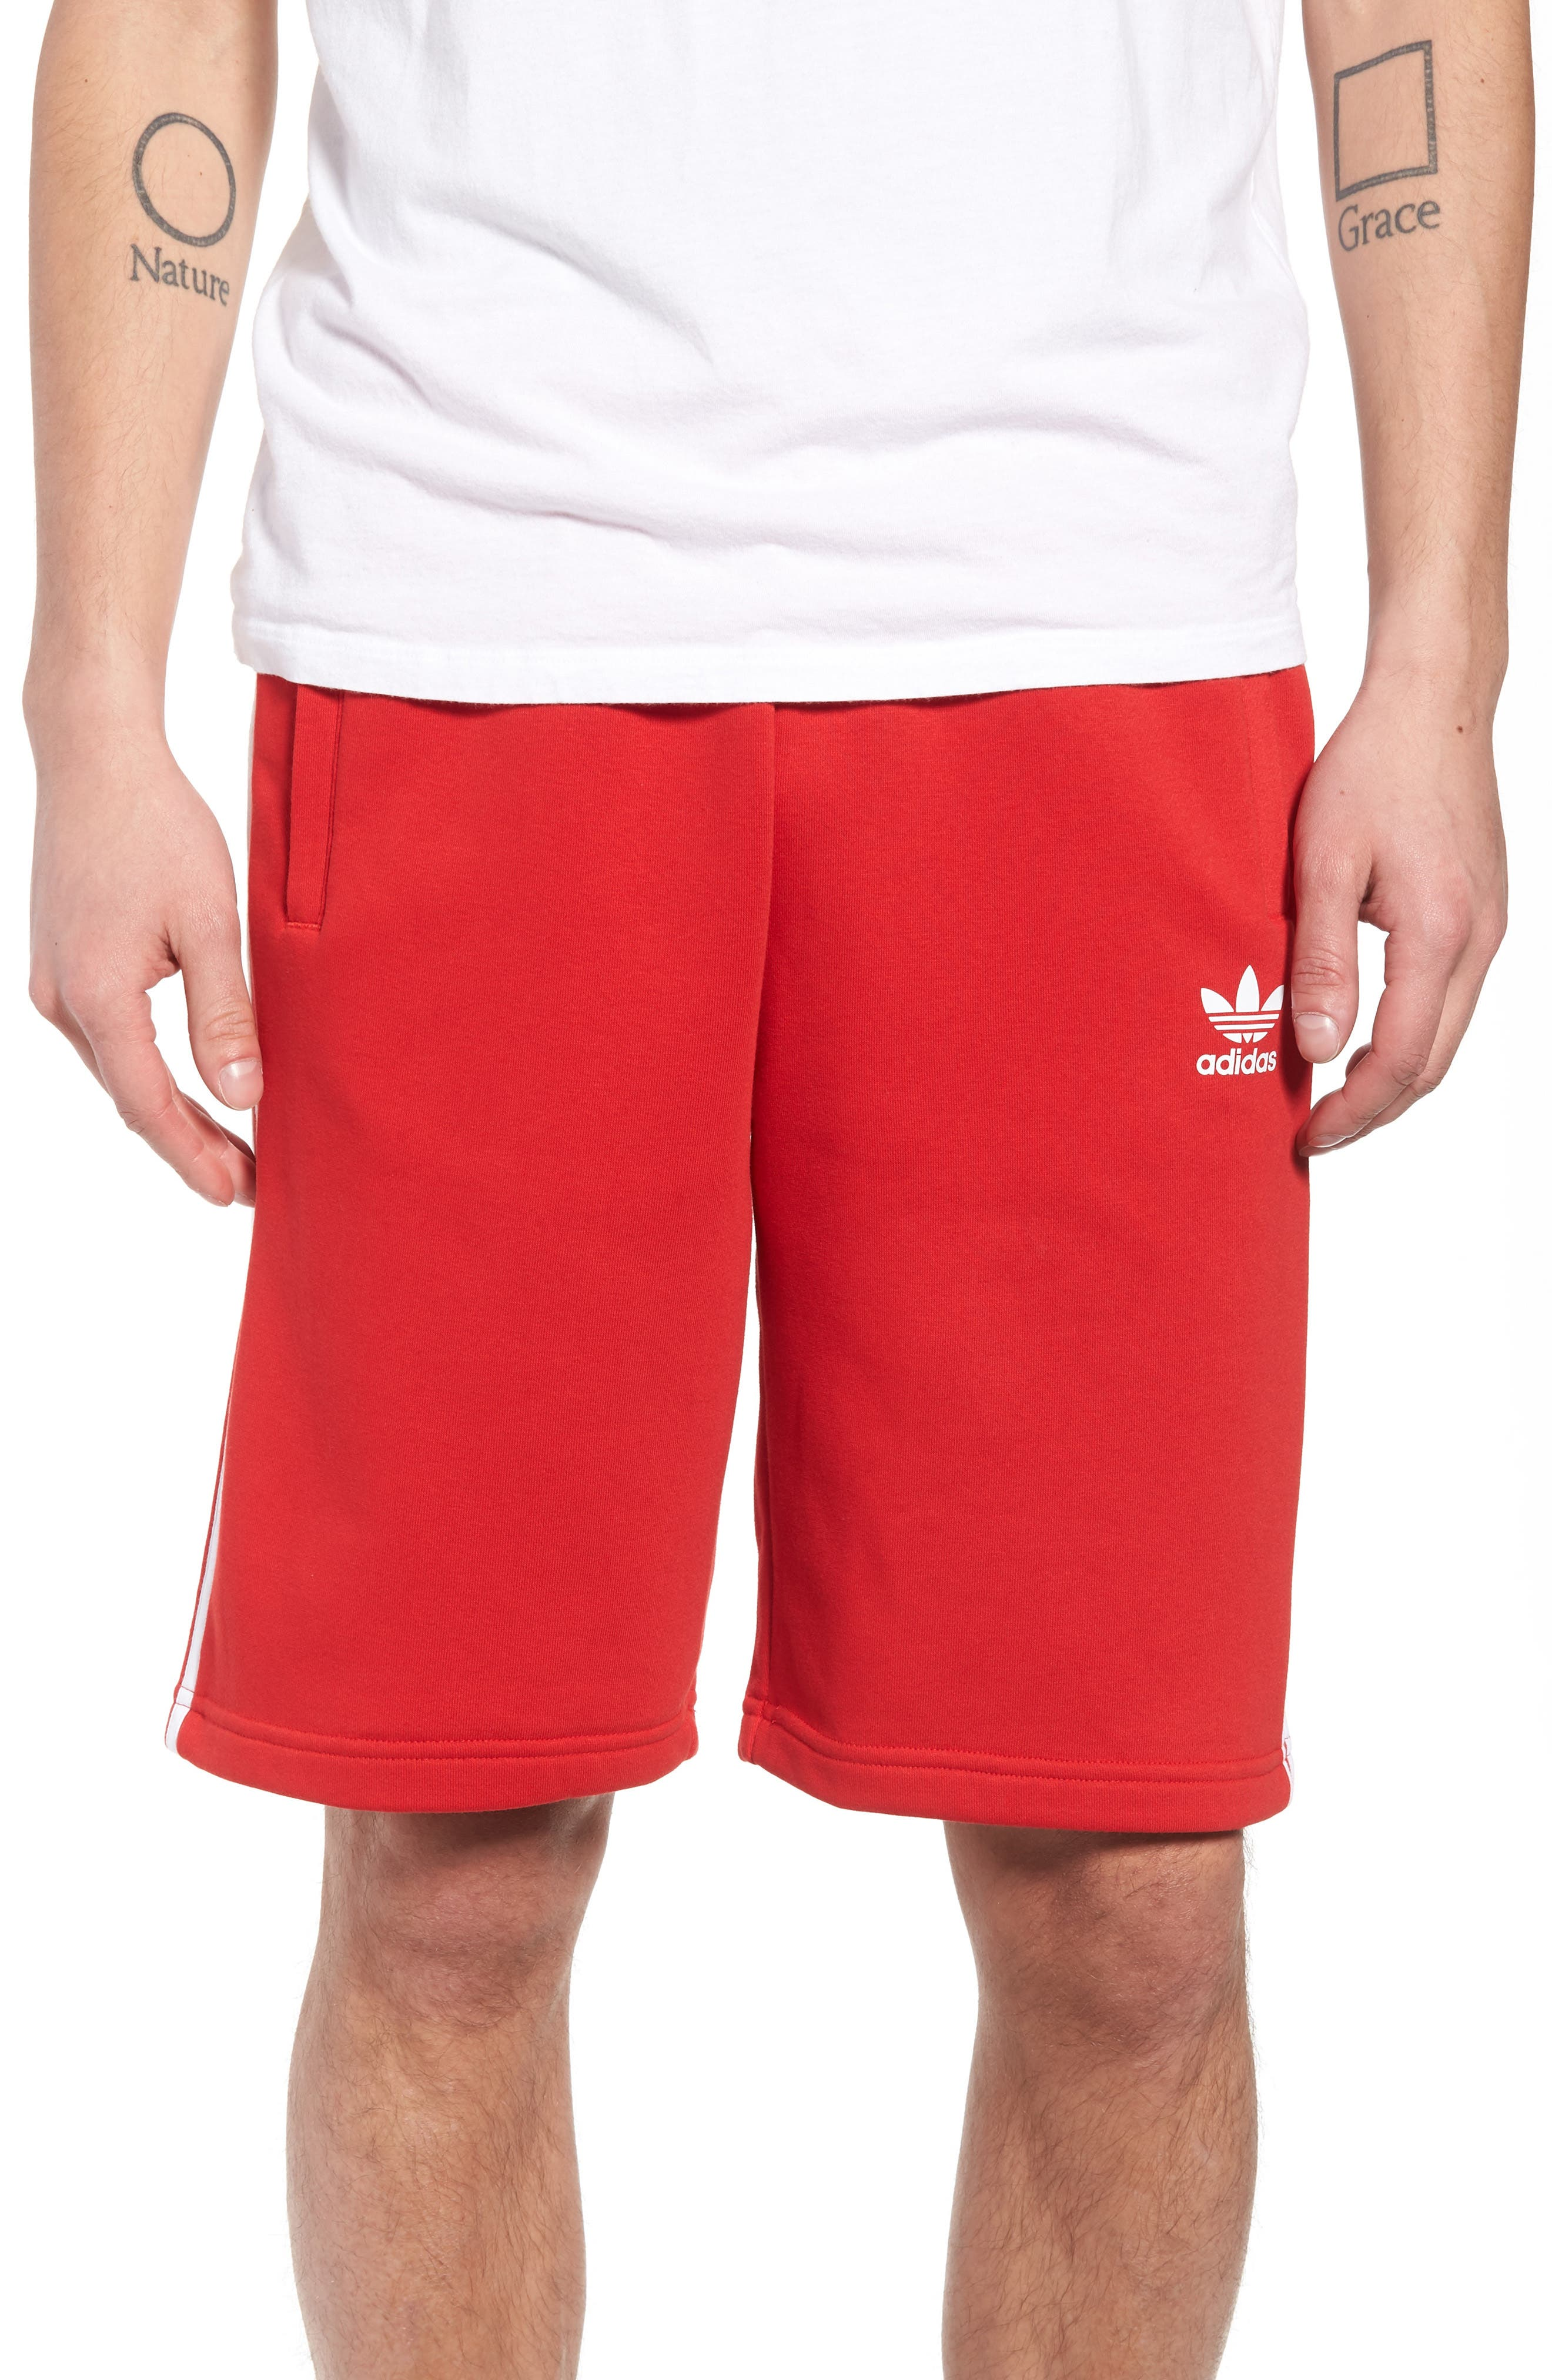 3-Stripes Shorts,                             Main thumbnail 1, color,                             Red/ White